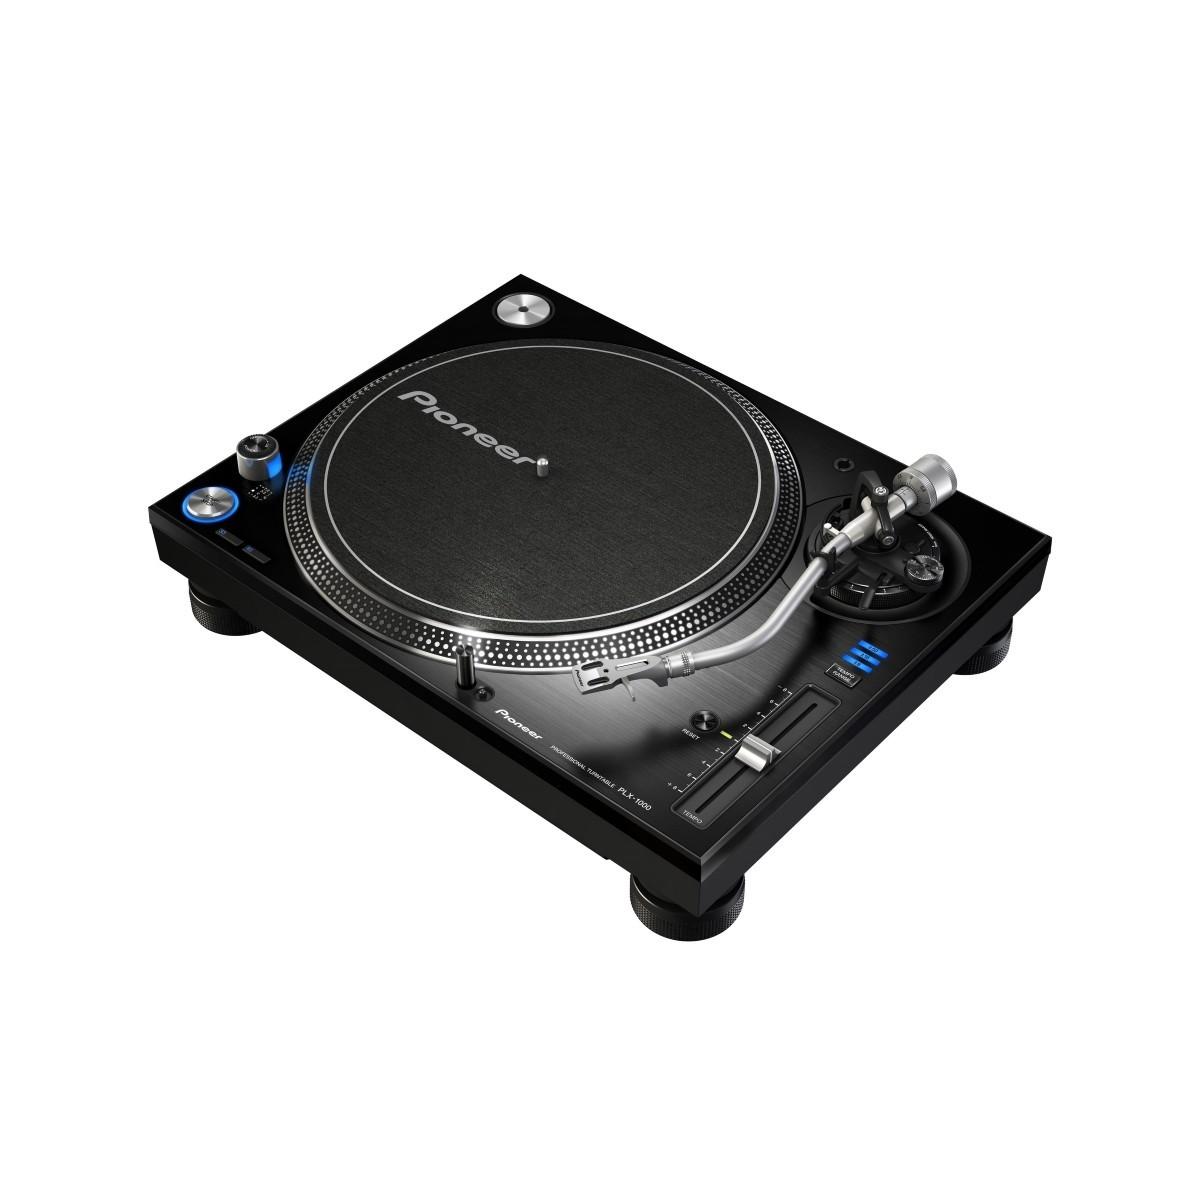 GIRADISCHI DJ PIONEER TRAZIONE DIRETTA PLX-1000